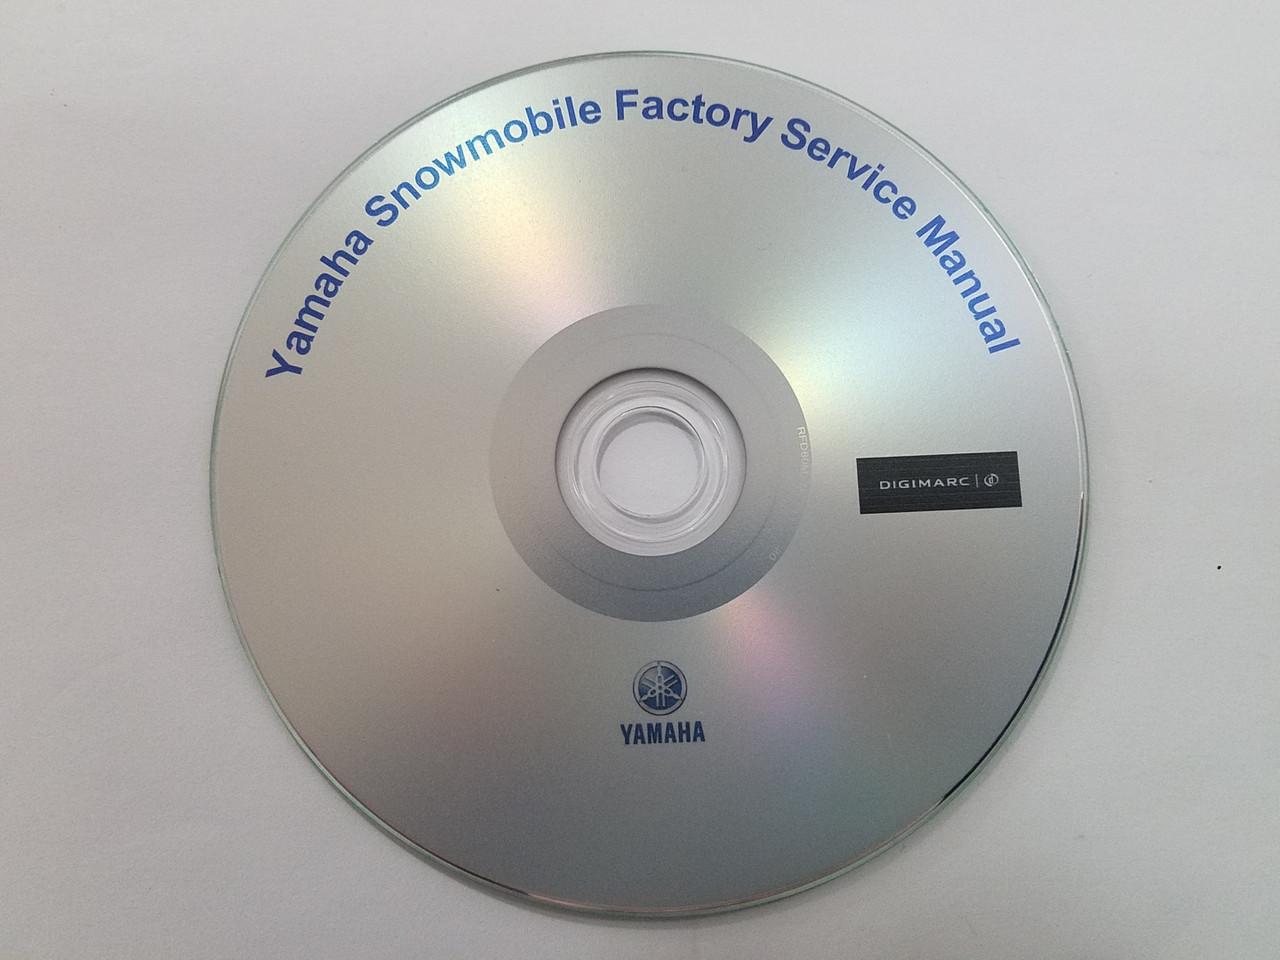 2013 Yamaha Snowmobile Manuals